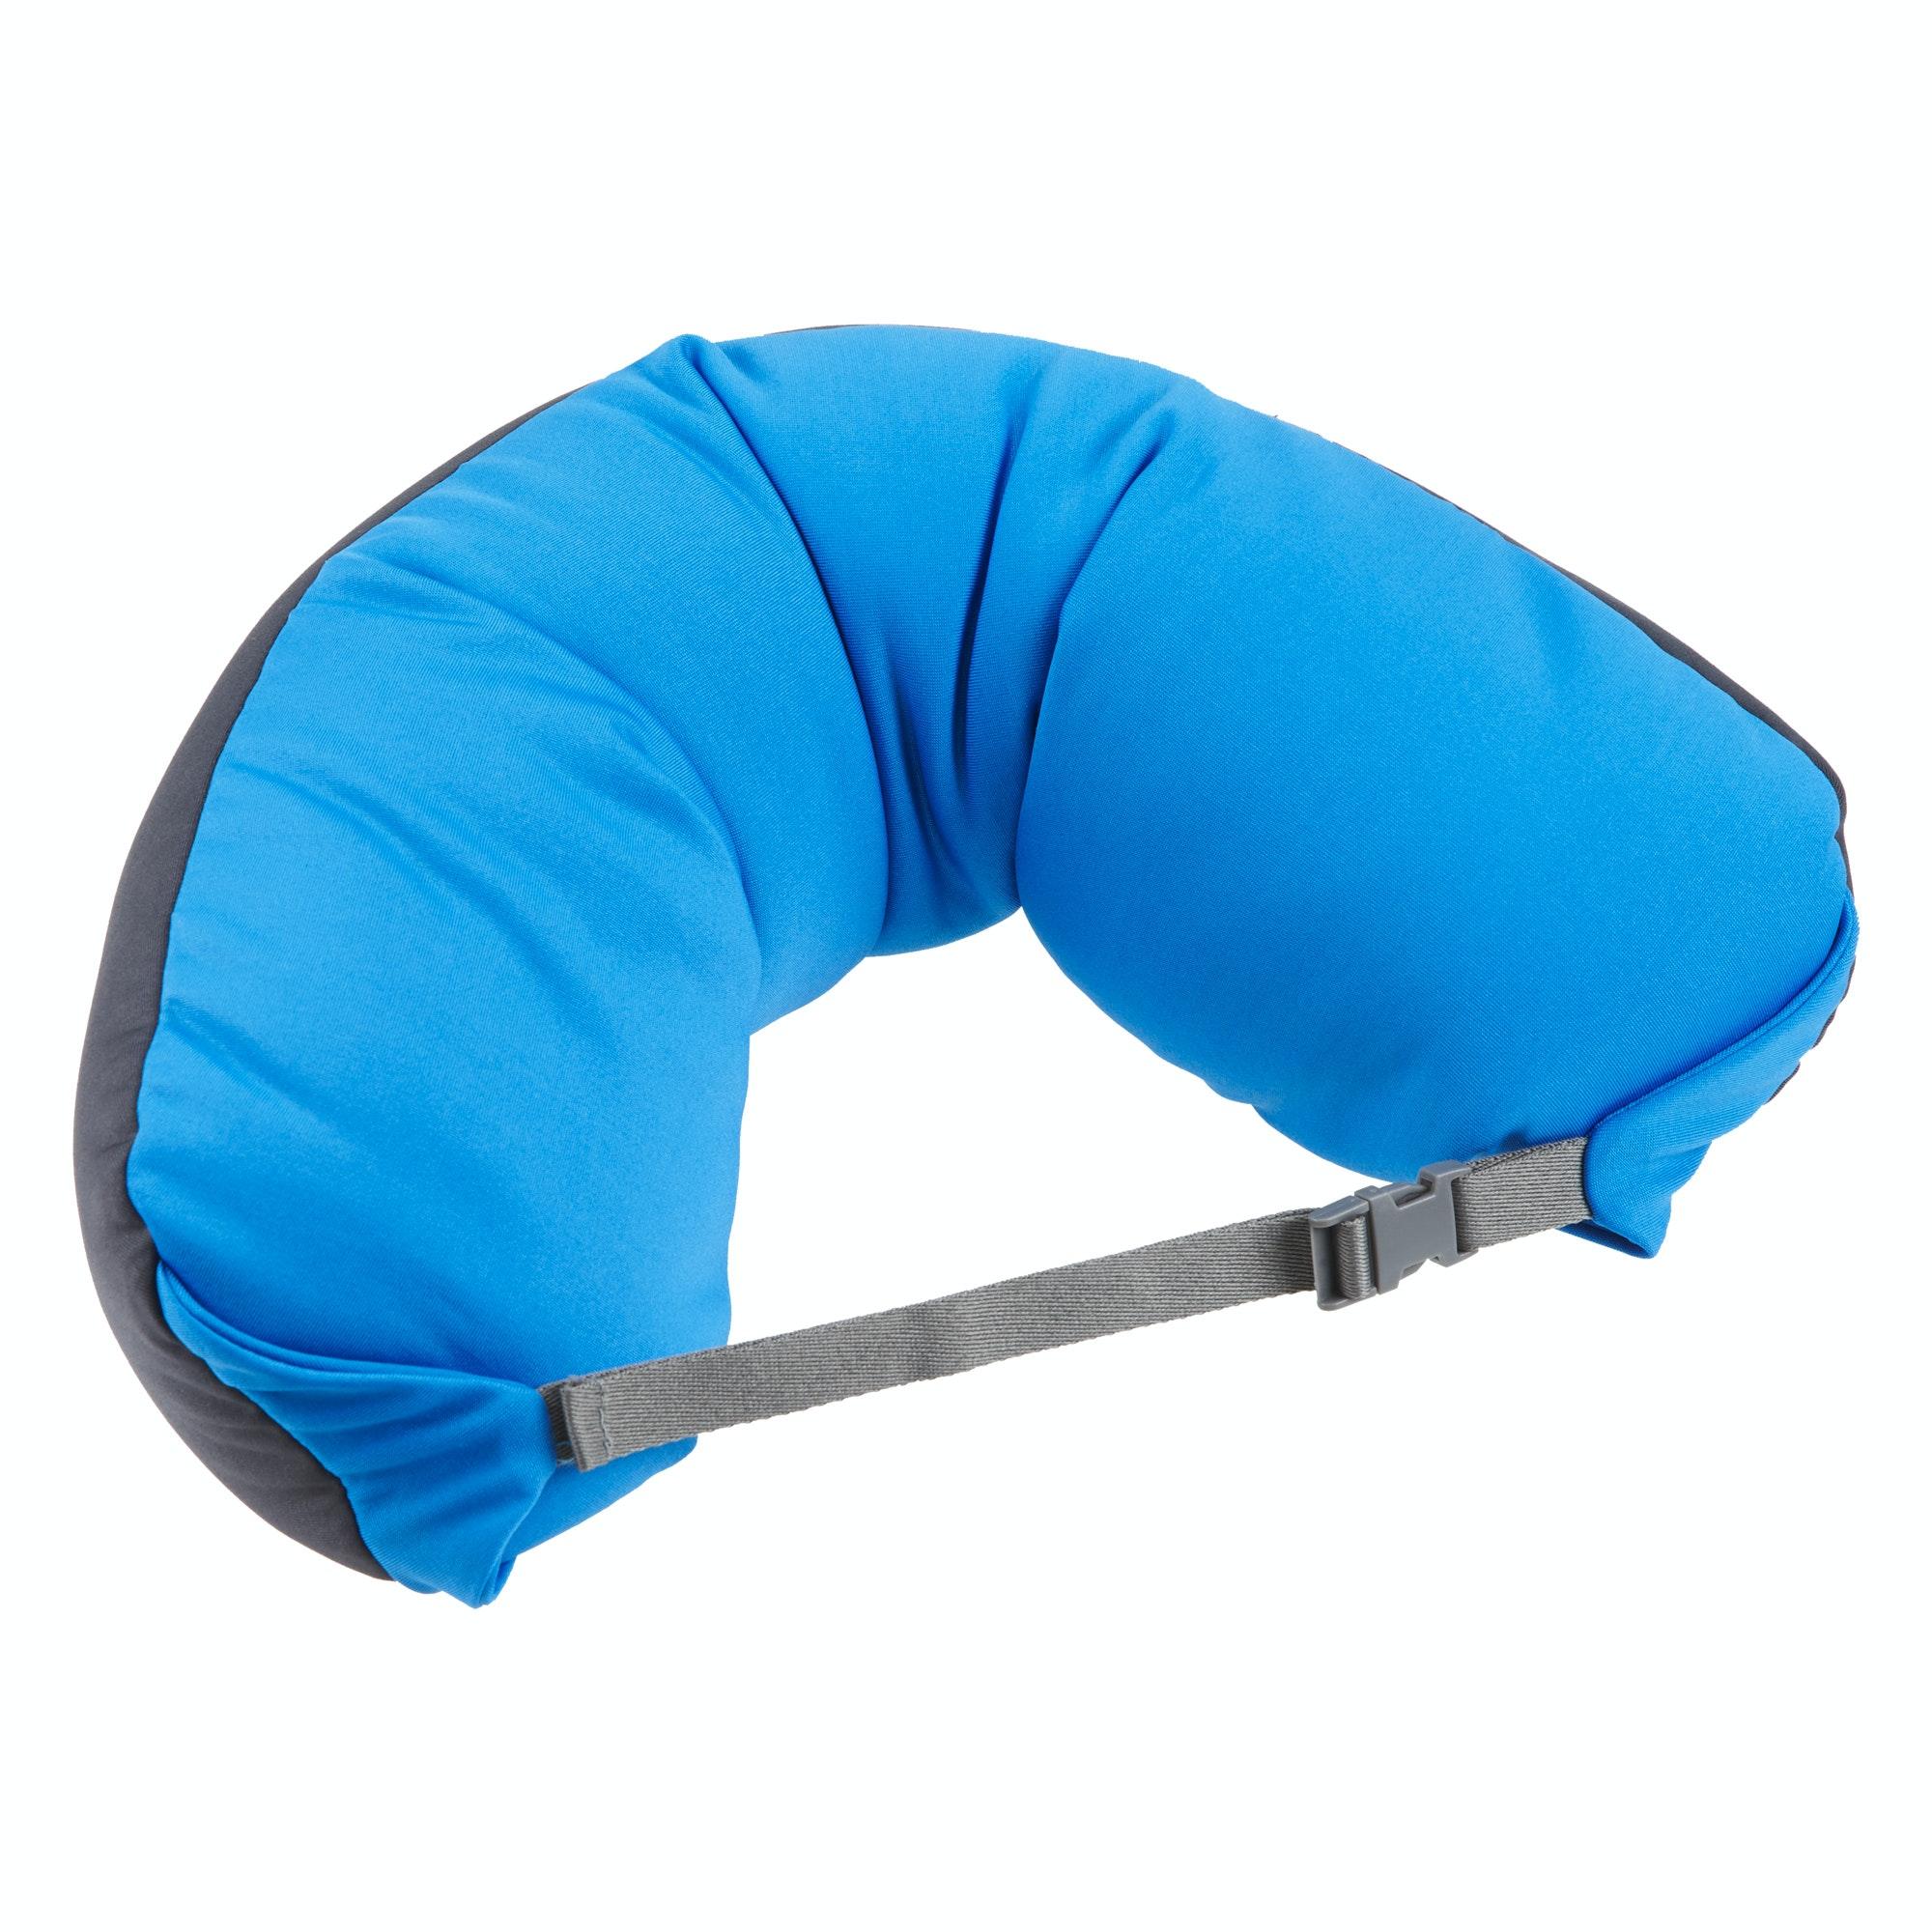 Kathmandu Long Adjustable Head Rest Neck Support Cushion